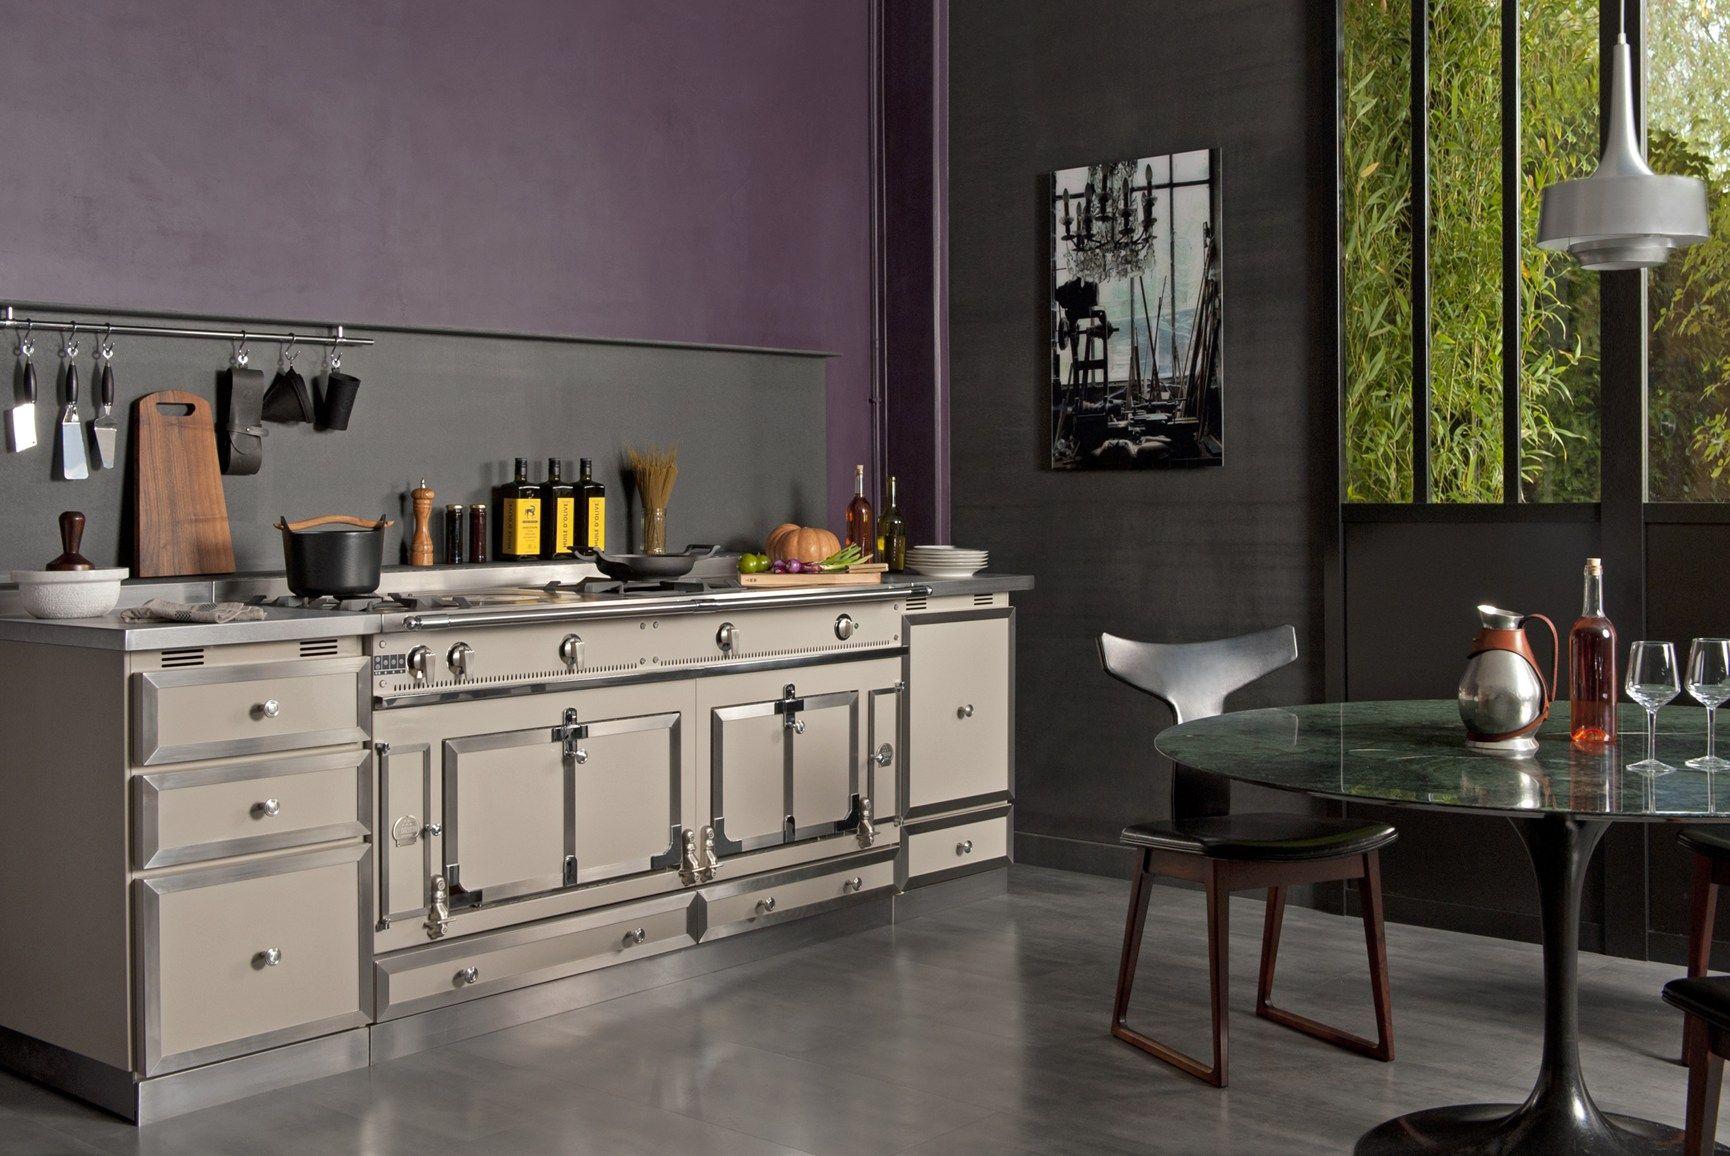 Fabulous colore casa esterno grigio come dipingere casa - Grancasa desenzano cucine ...